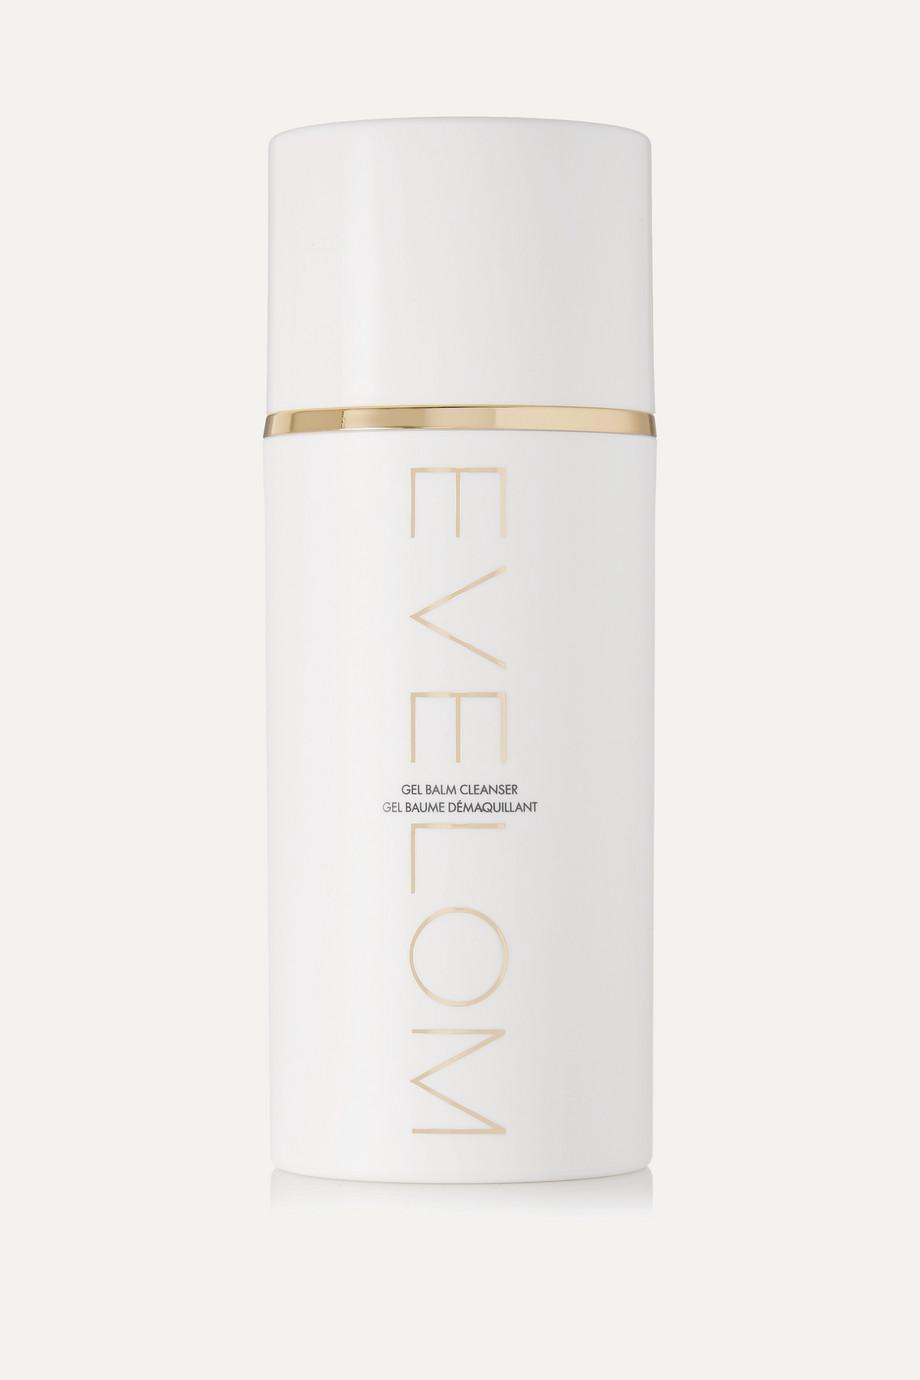 Eve Lom Gel Balm Cleanser, 100 ml – Reinigungsgel